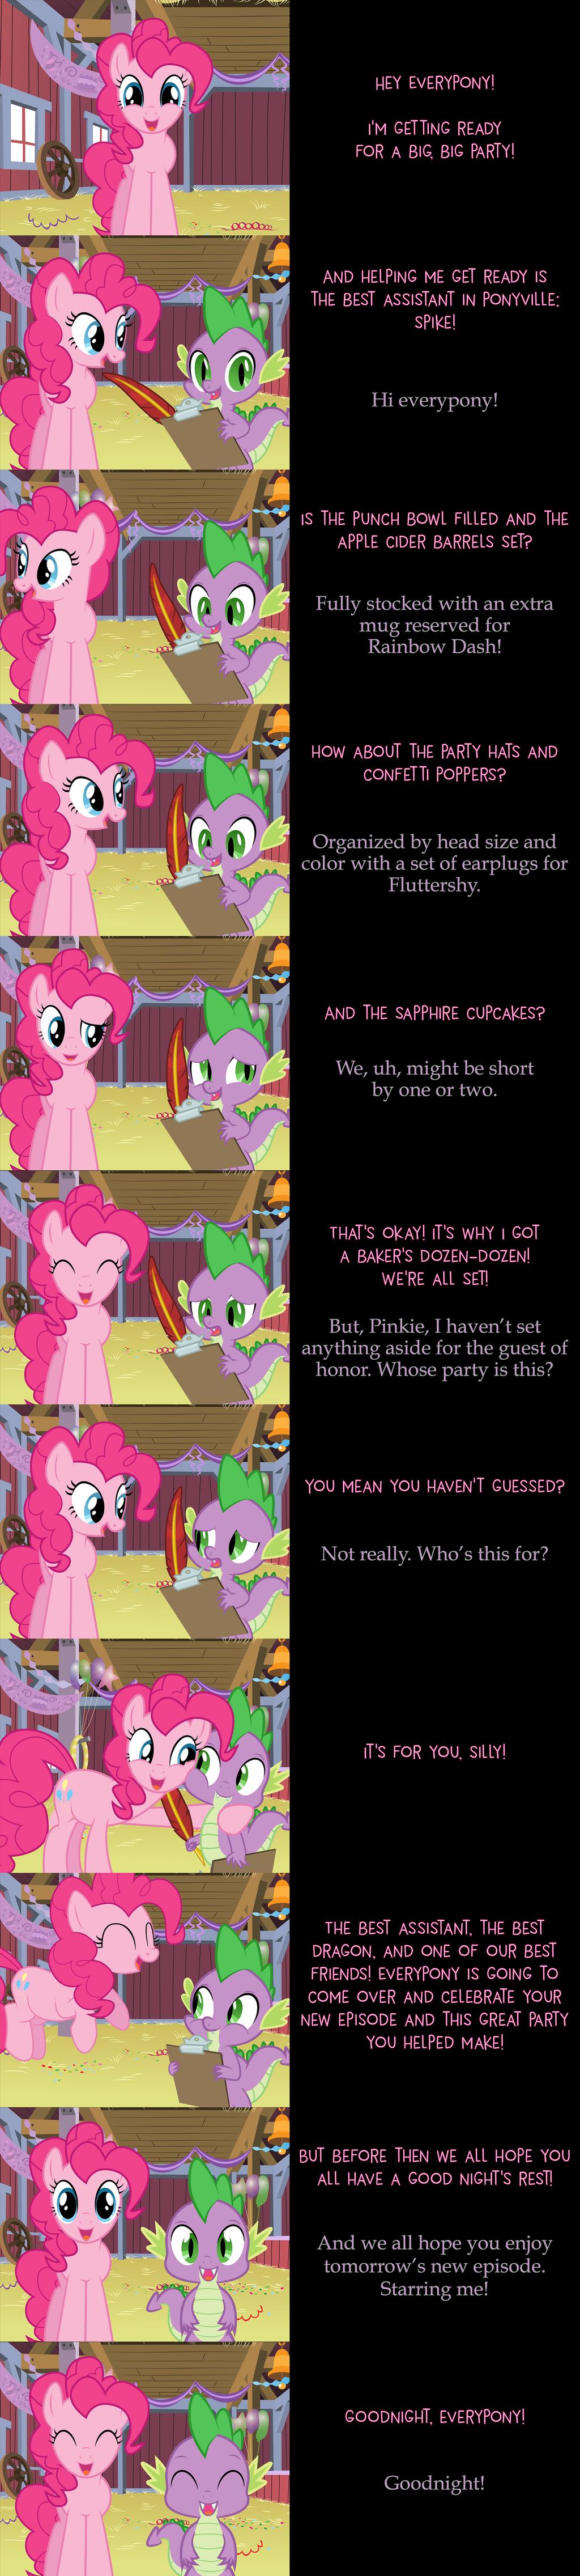 Pinkie Pie Says Goodnight: Prepped